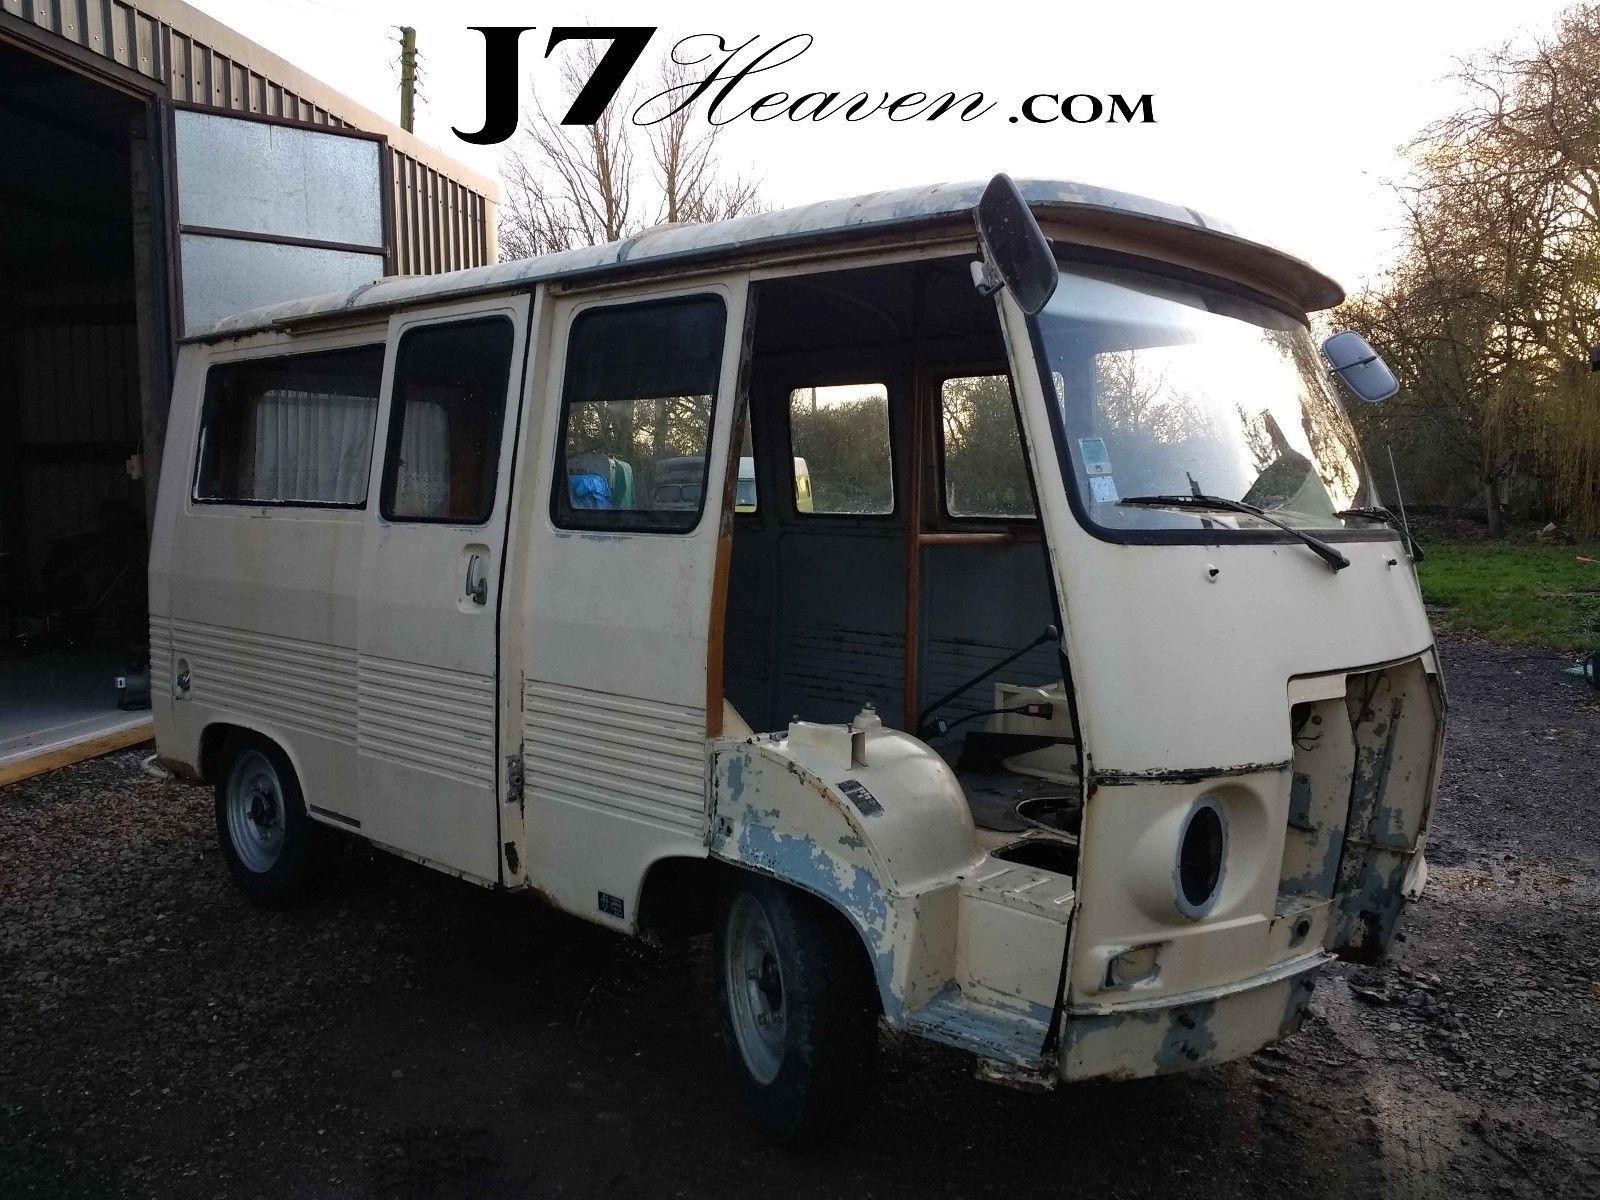 eBay: Peugeot j7 - Restored Vehicles for use as catering camper food ...